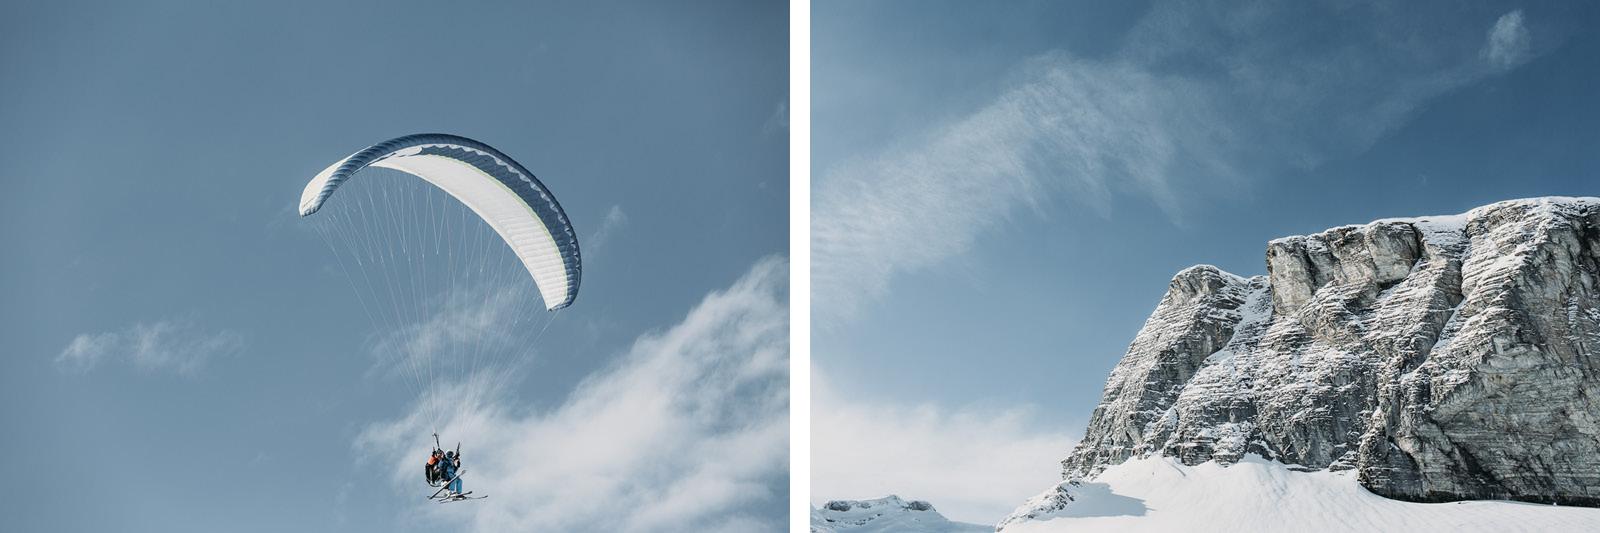 Evabloem_travel_wintersports_le-grande-massif-0013a.jpg